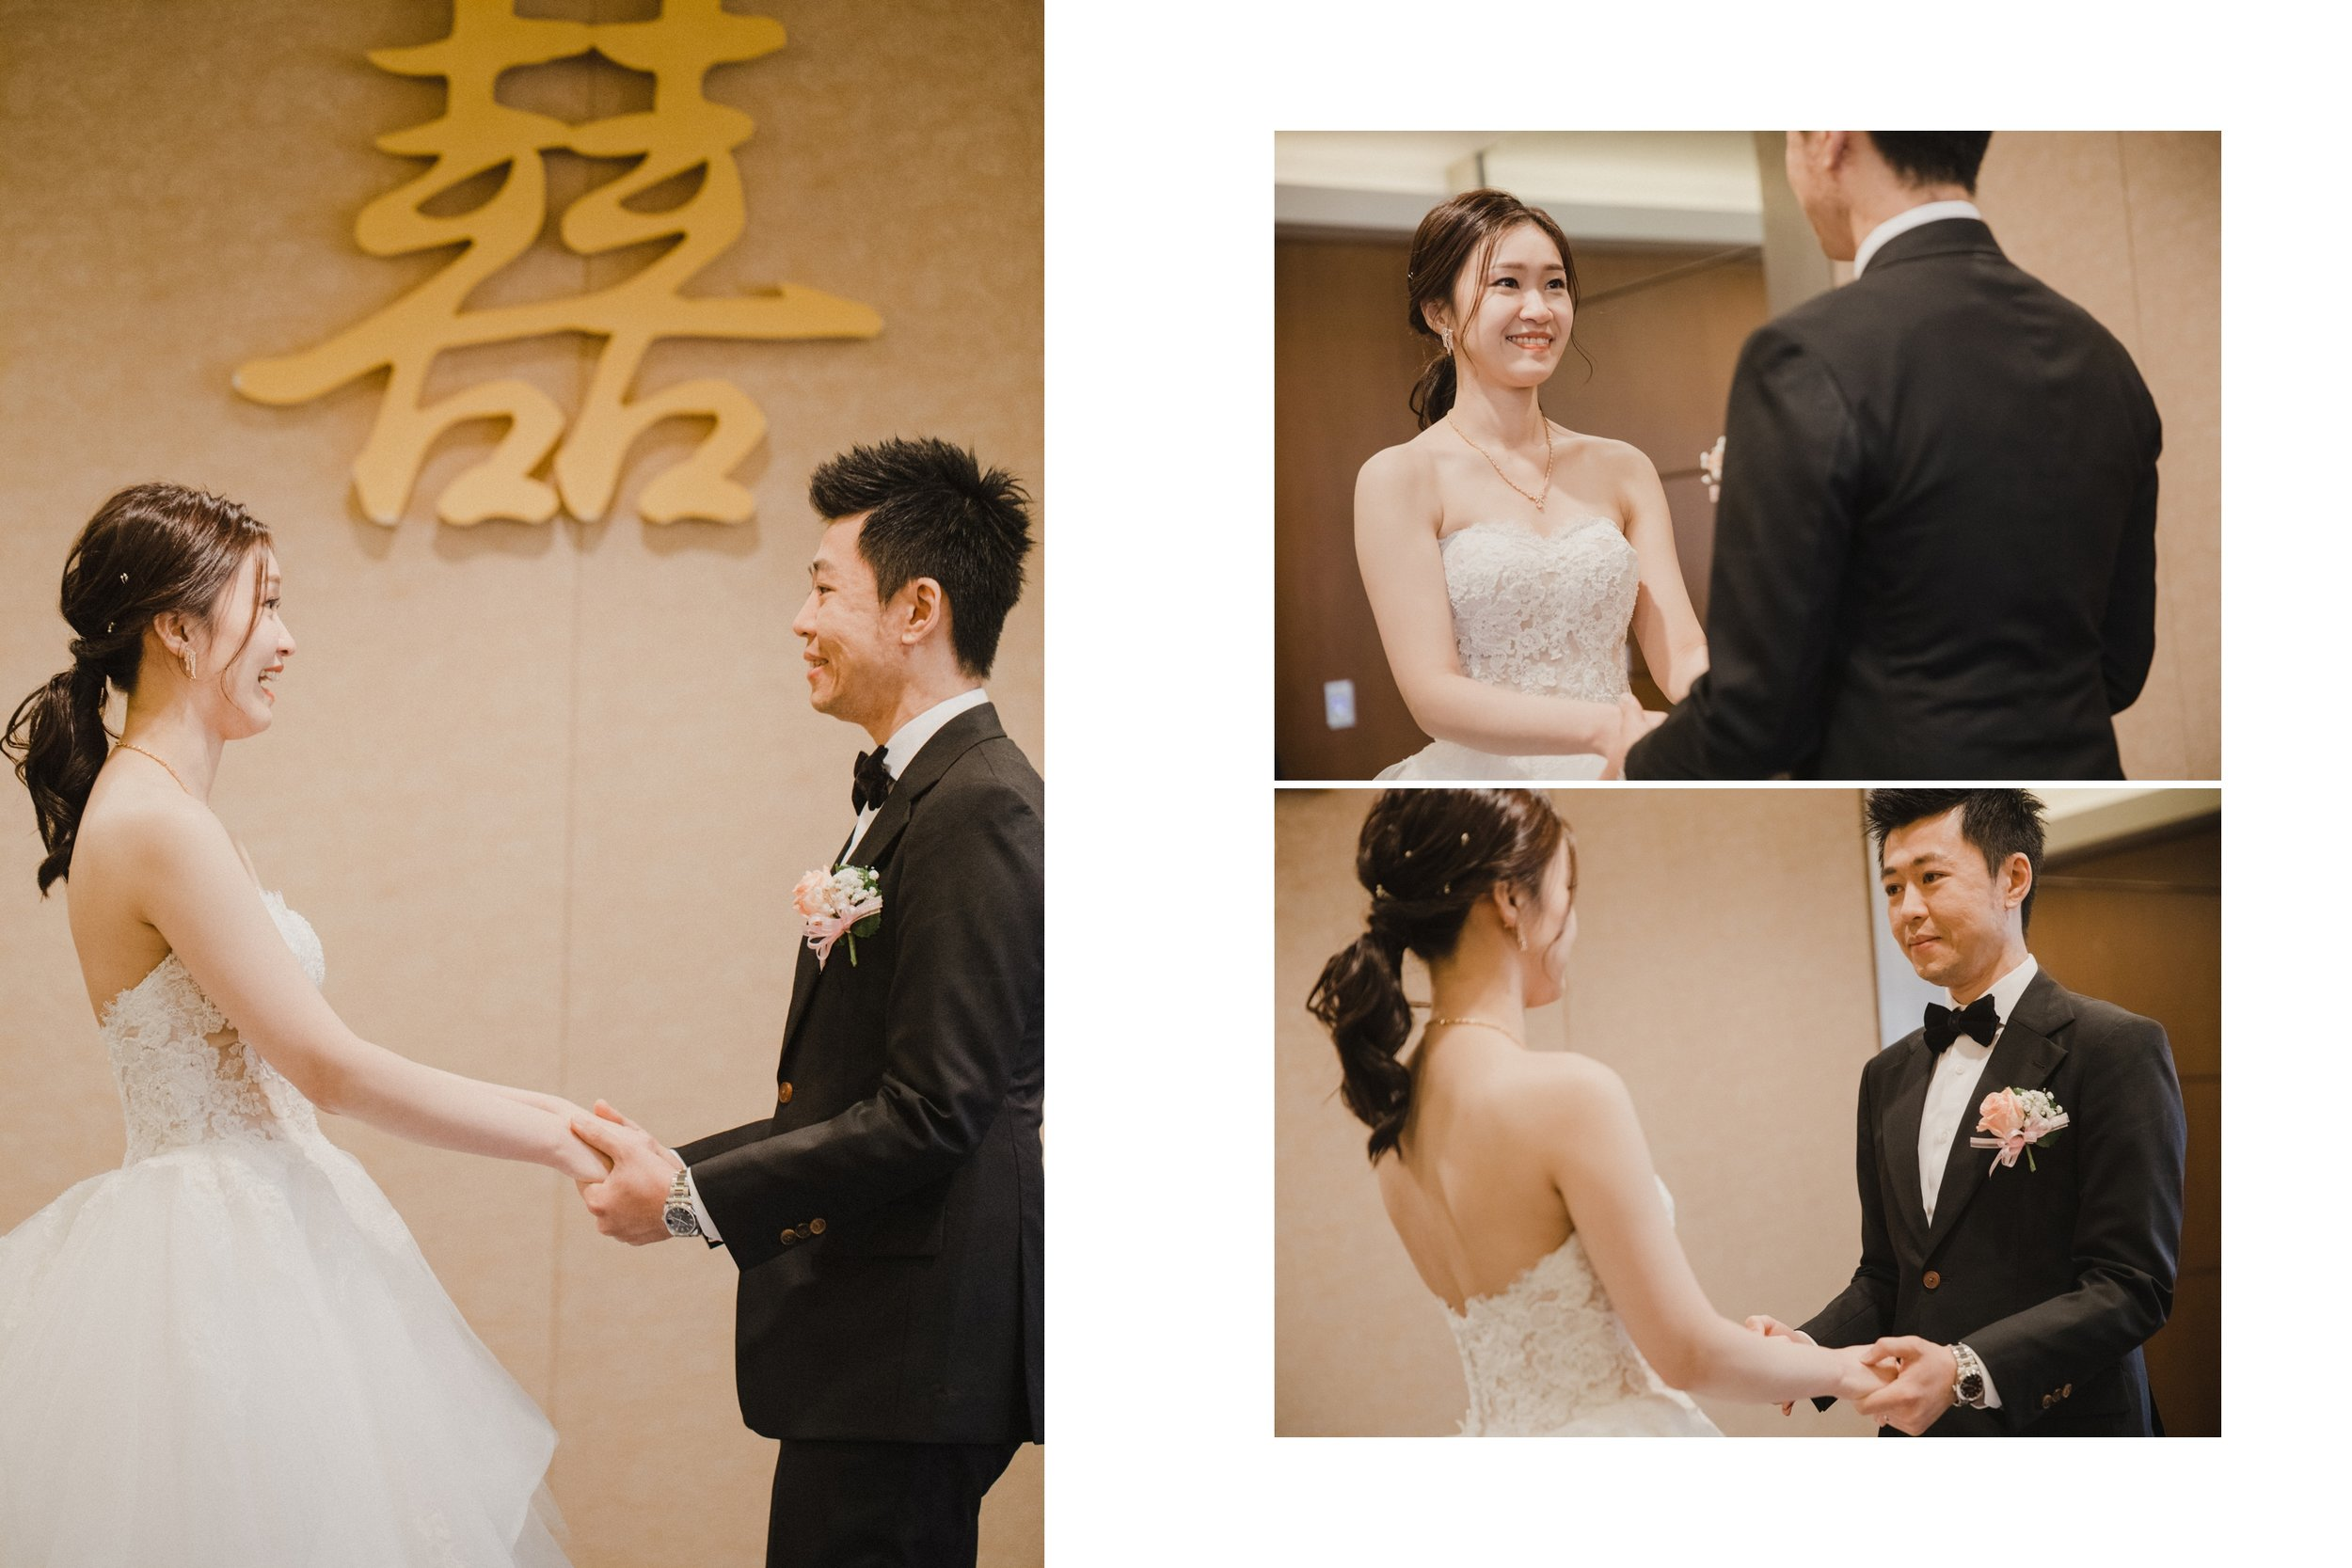 wedding-caridee-oscar-lunch-ambassador-hsinchu-結婚午宴-新竹國賓_80.jpg